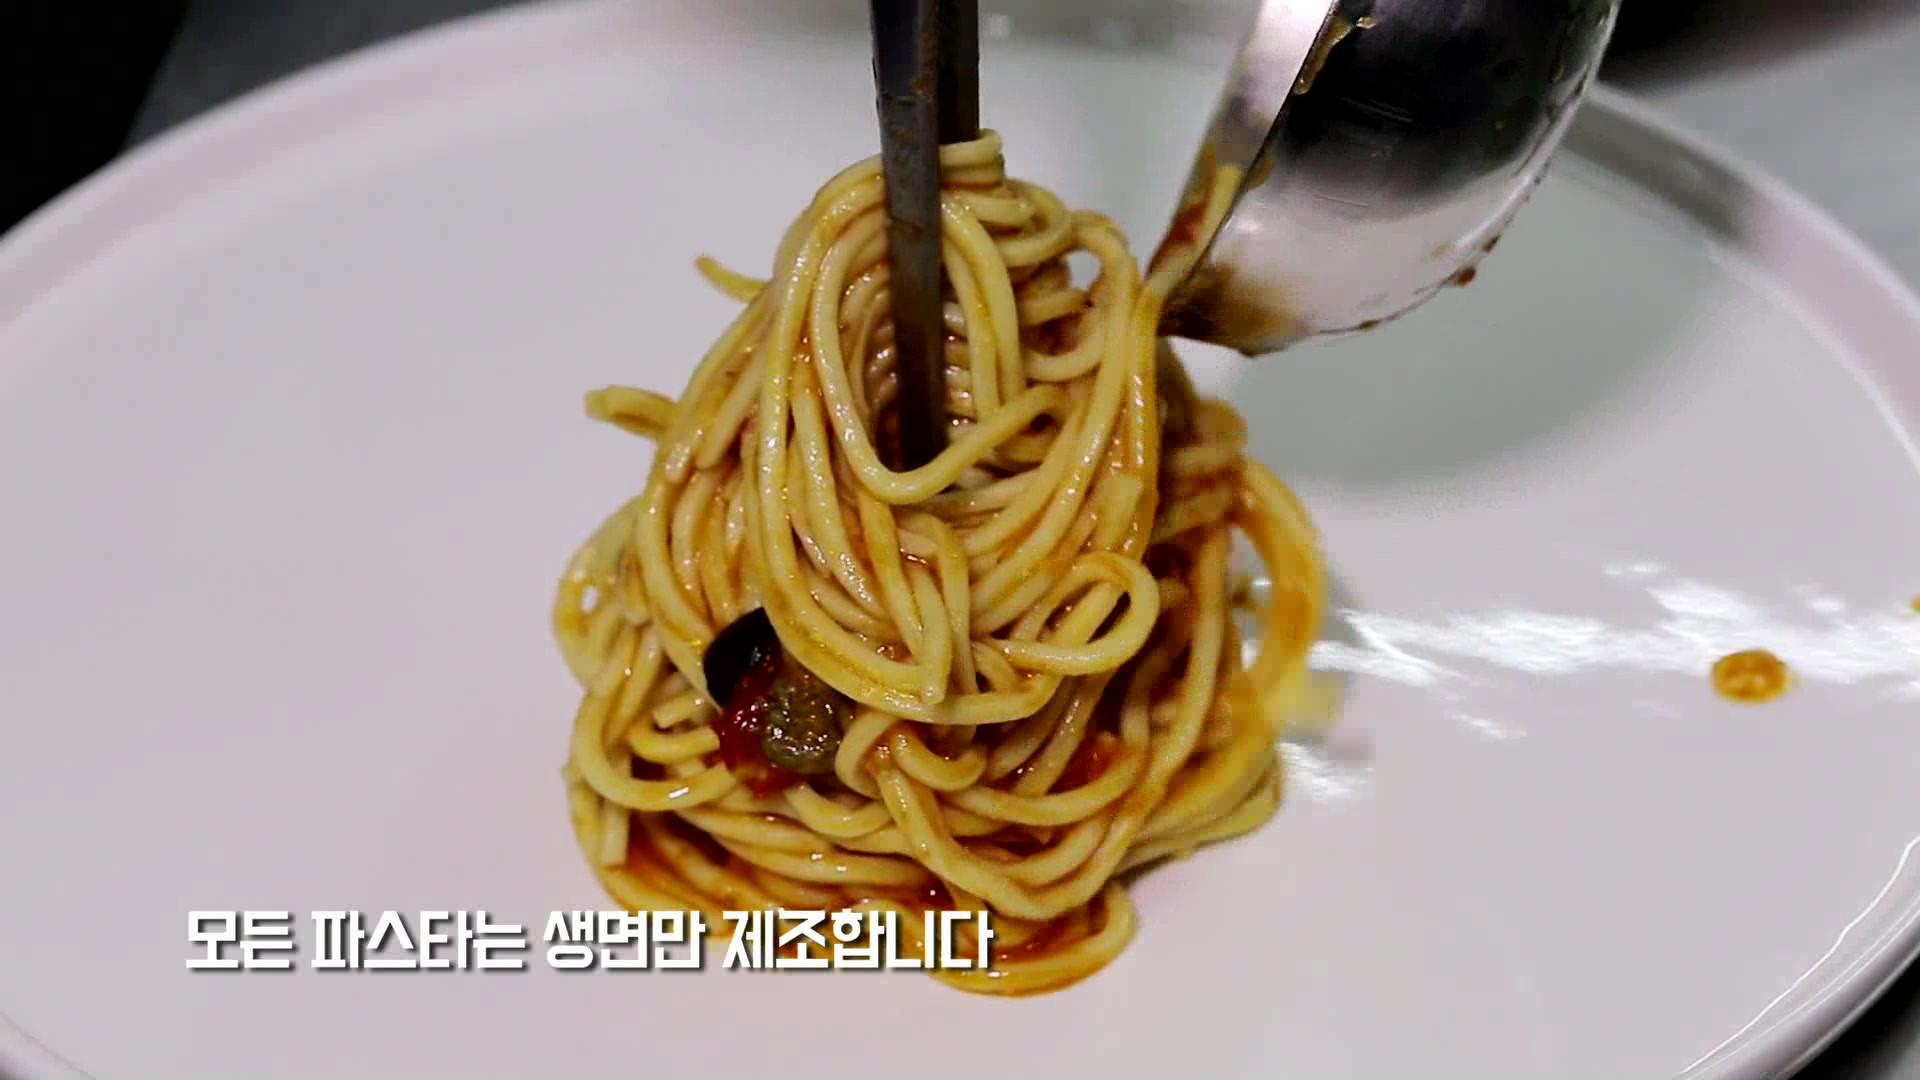 2017-09-15_CF영상 1.49.mp4